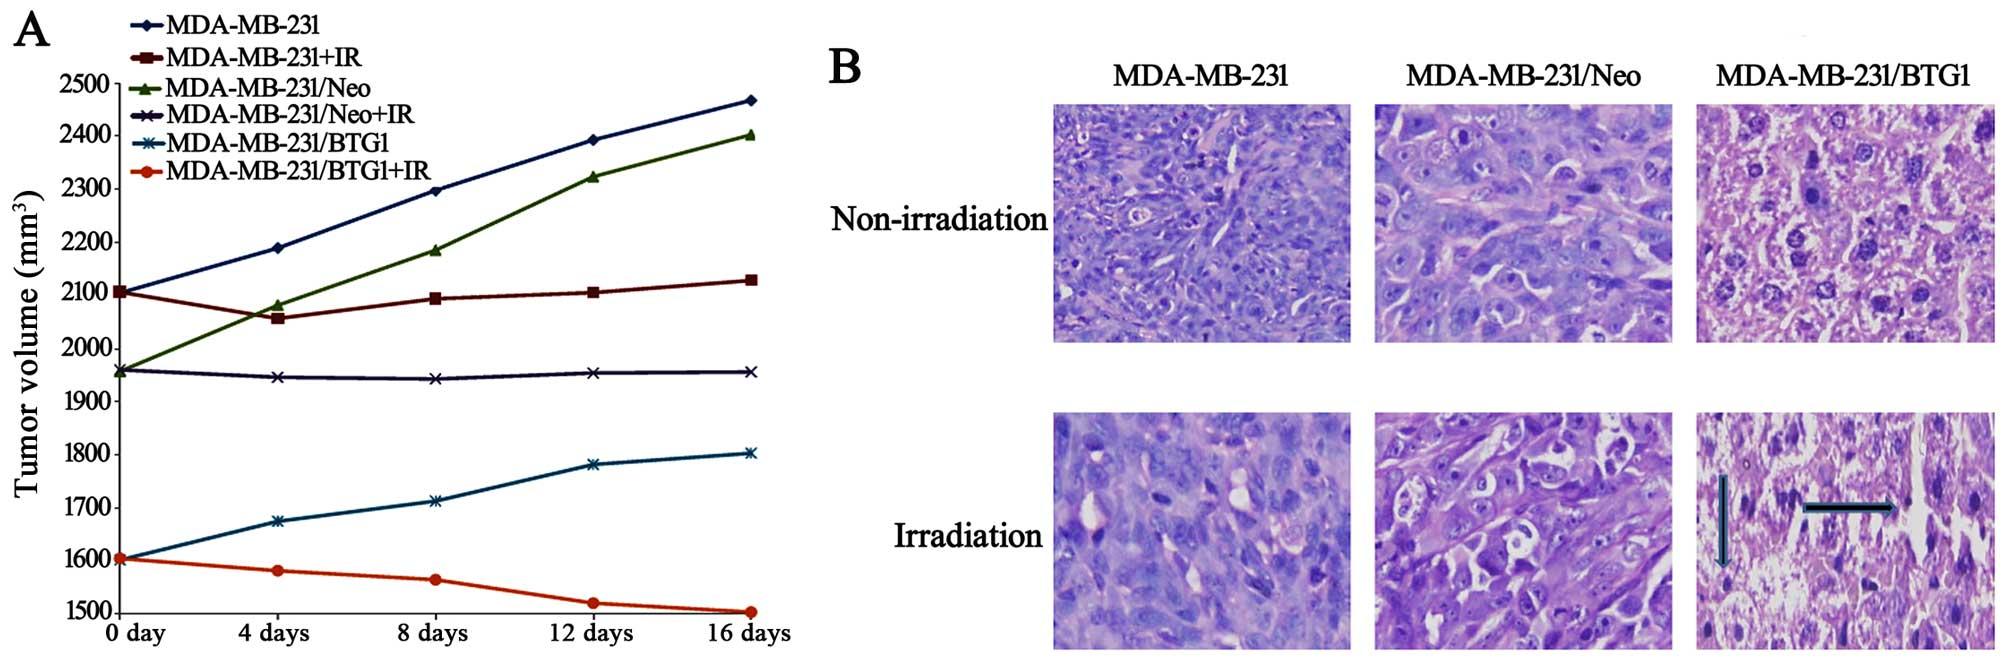 Upregulation of BTG1 enhances the radiation sensitivity of